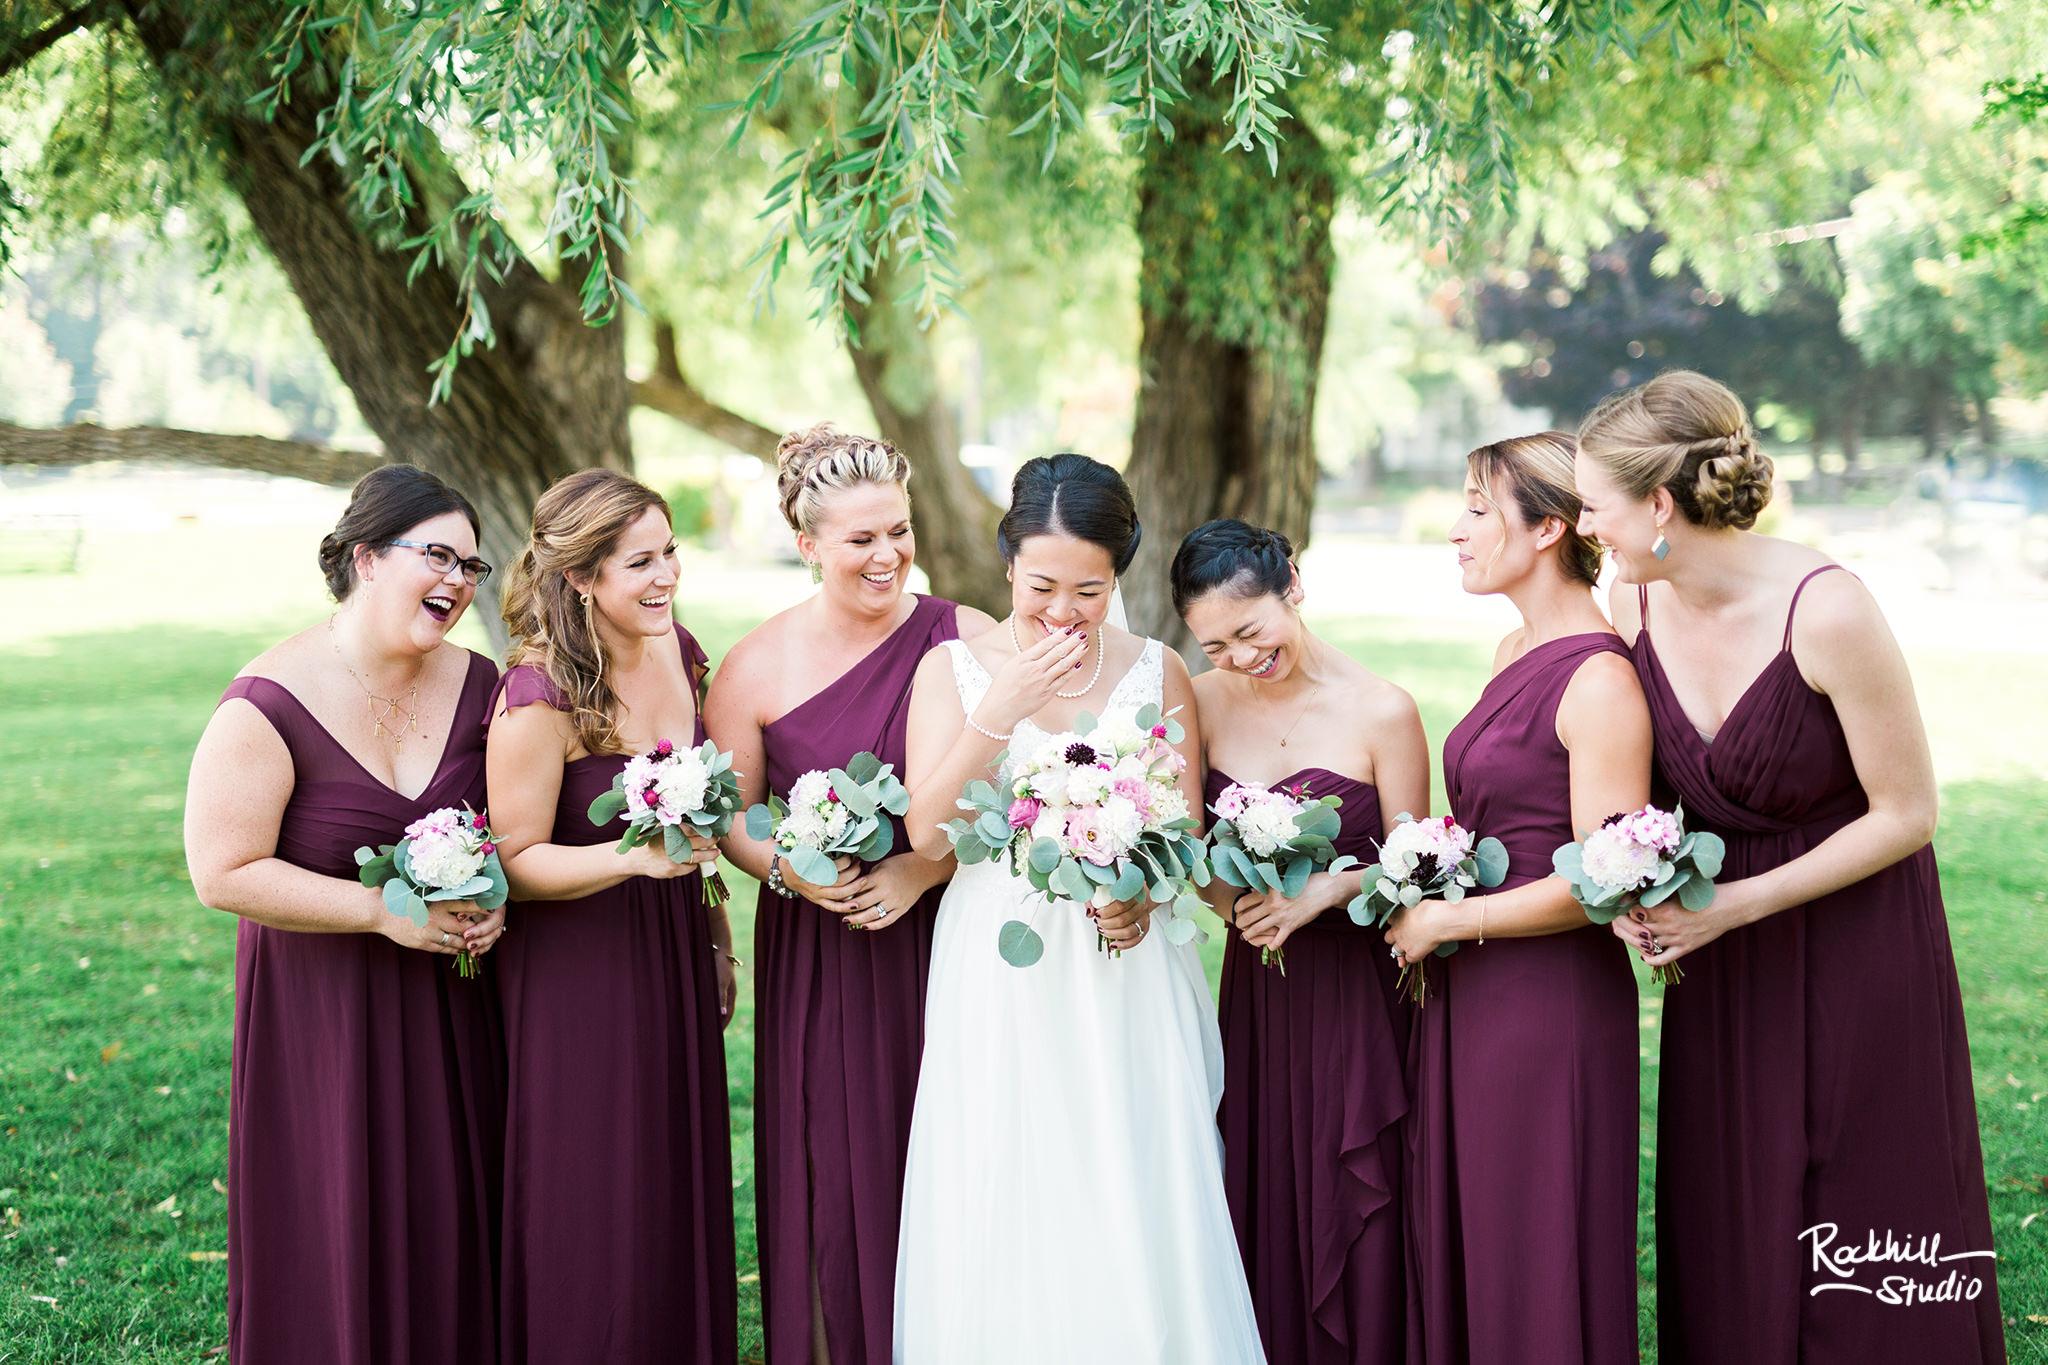 Northport michigan bridesmaids, traverse city wedding photographer rockhill studio